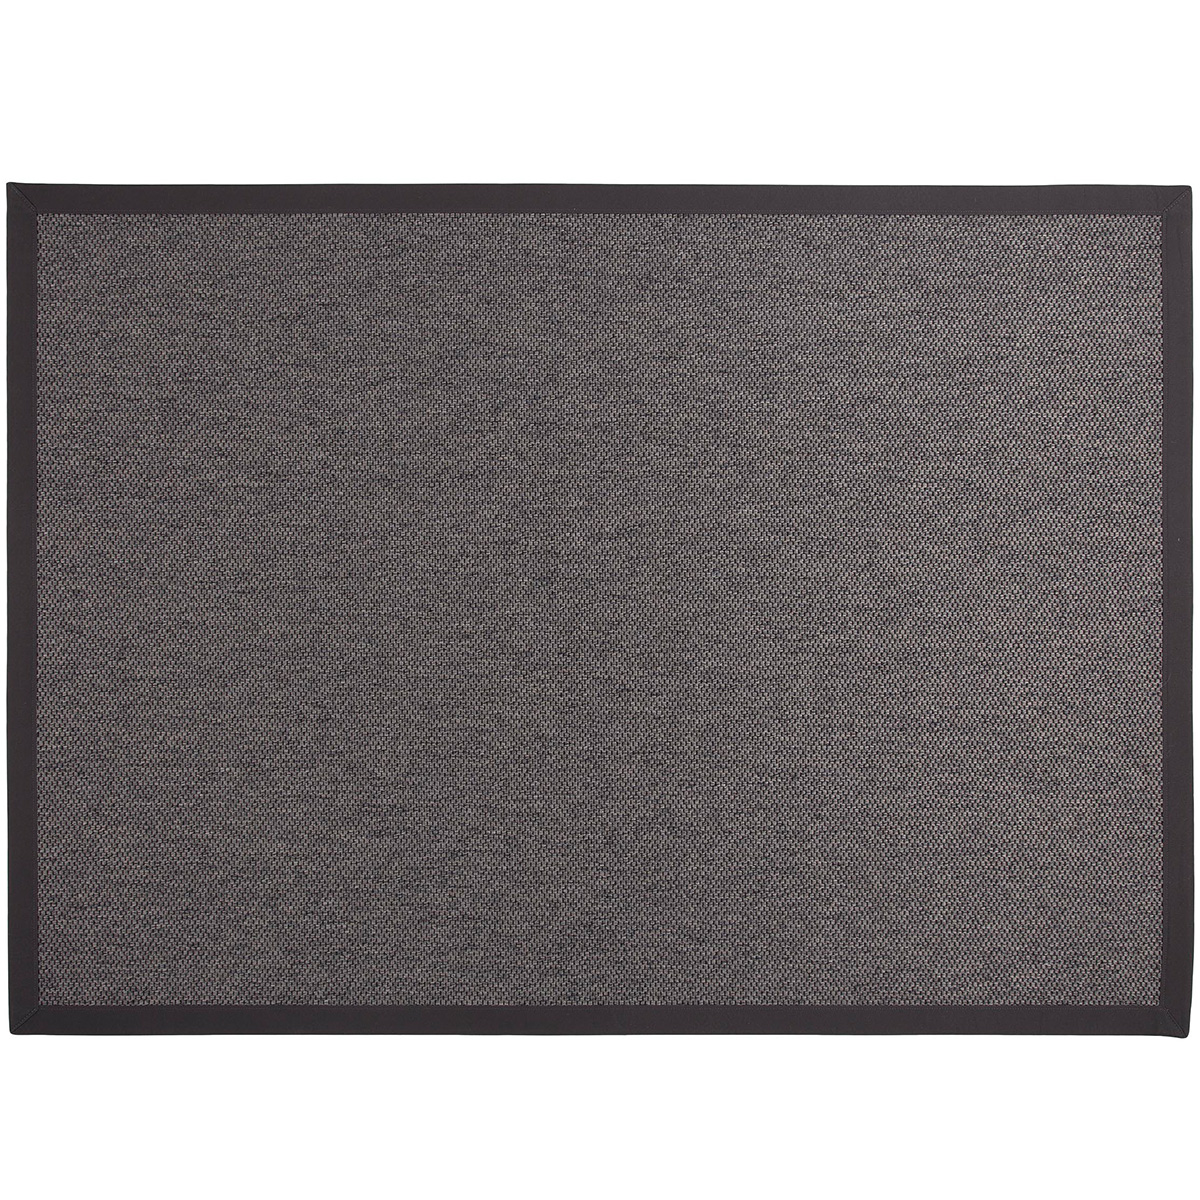 Vloerkleed Brinker Dynamo Grey | 200 x 300 cm